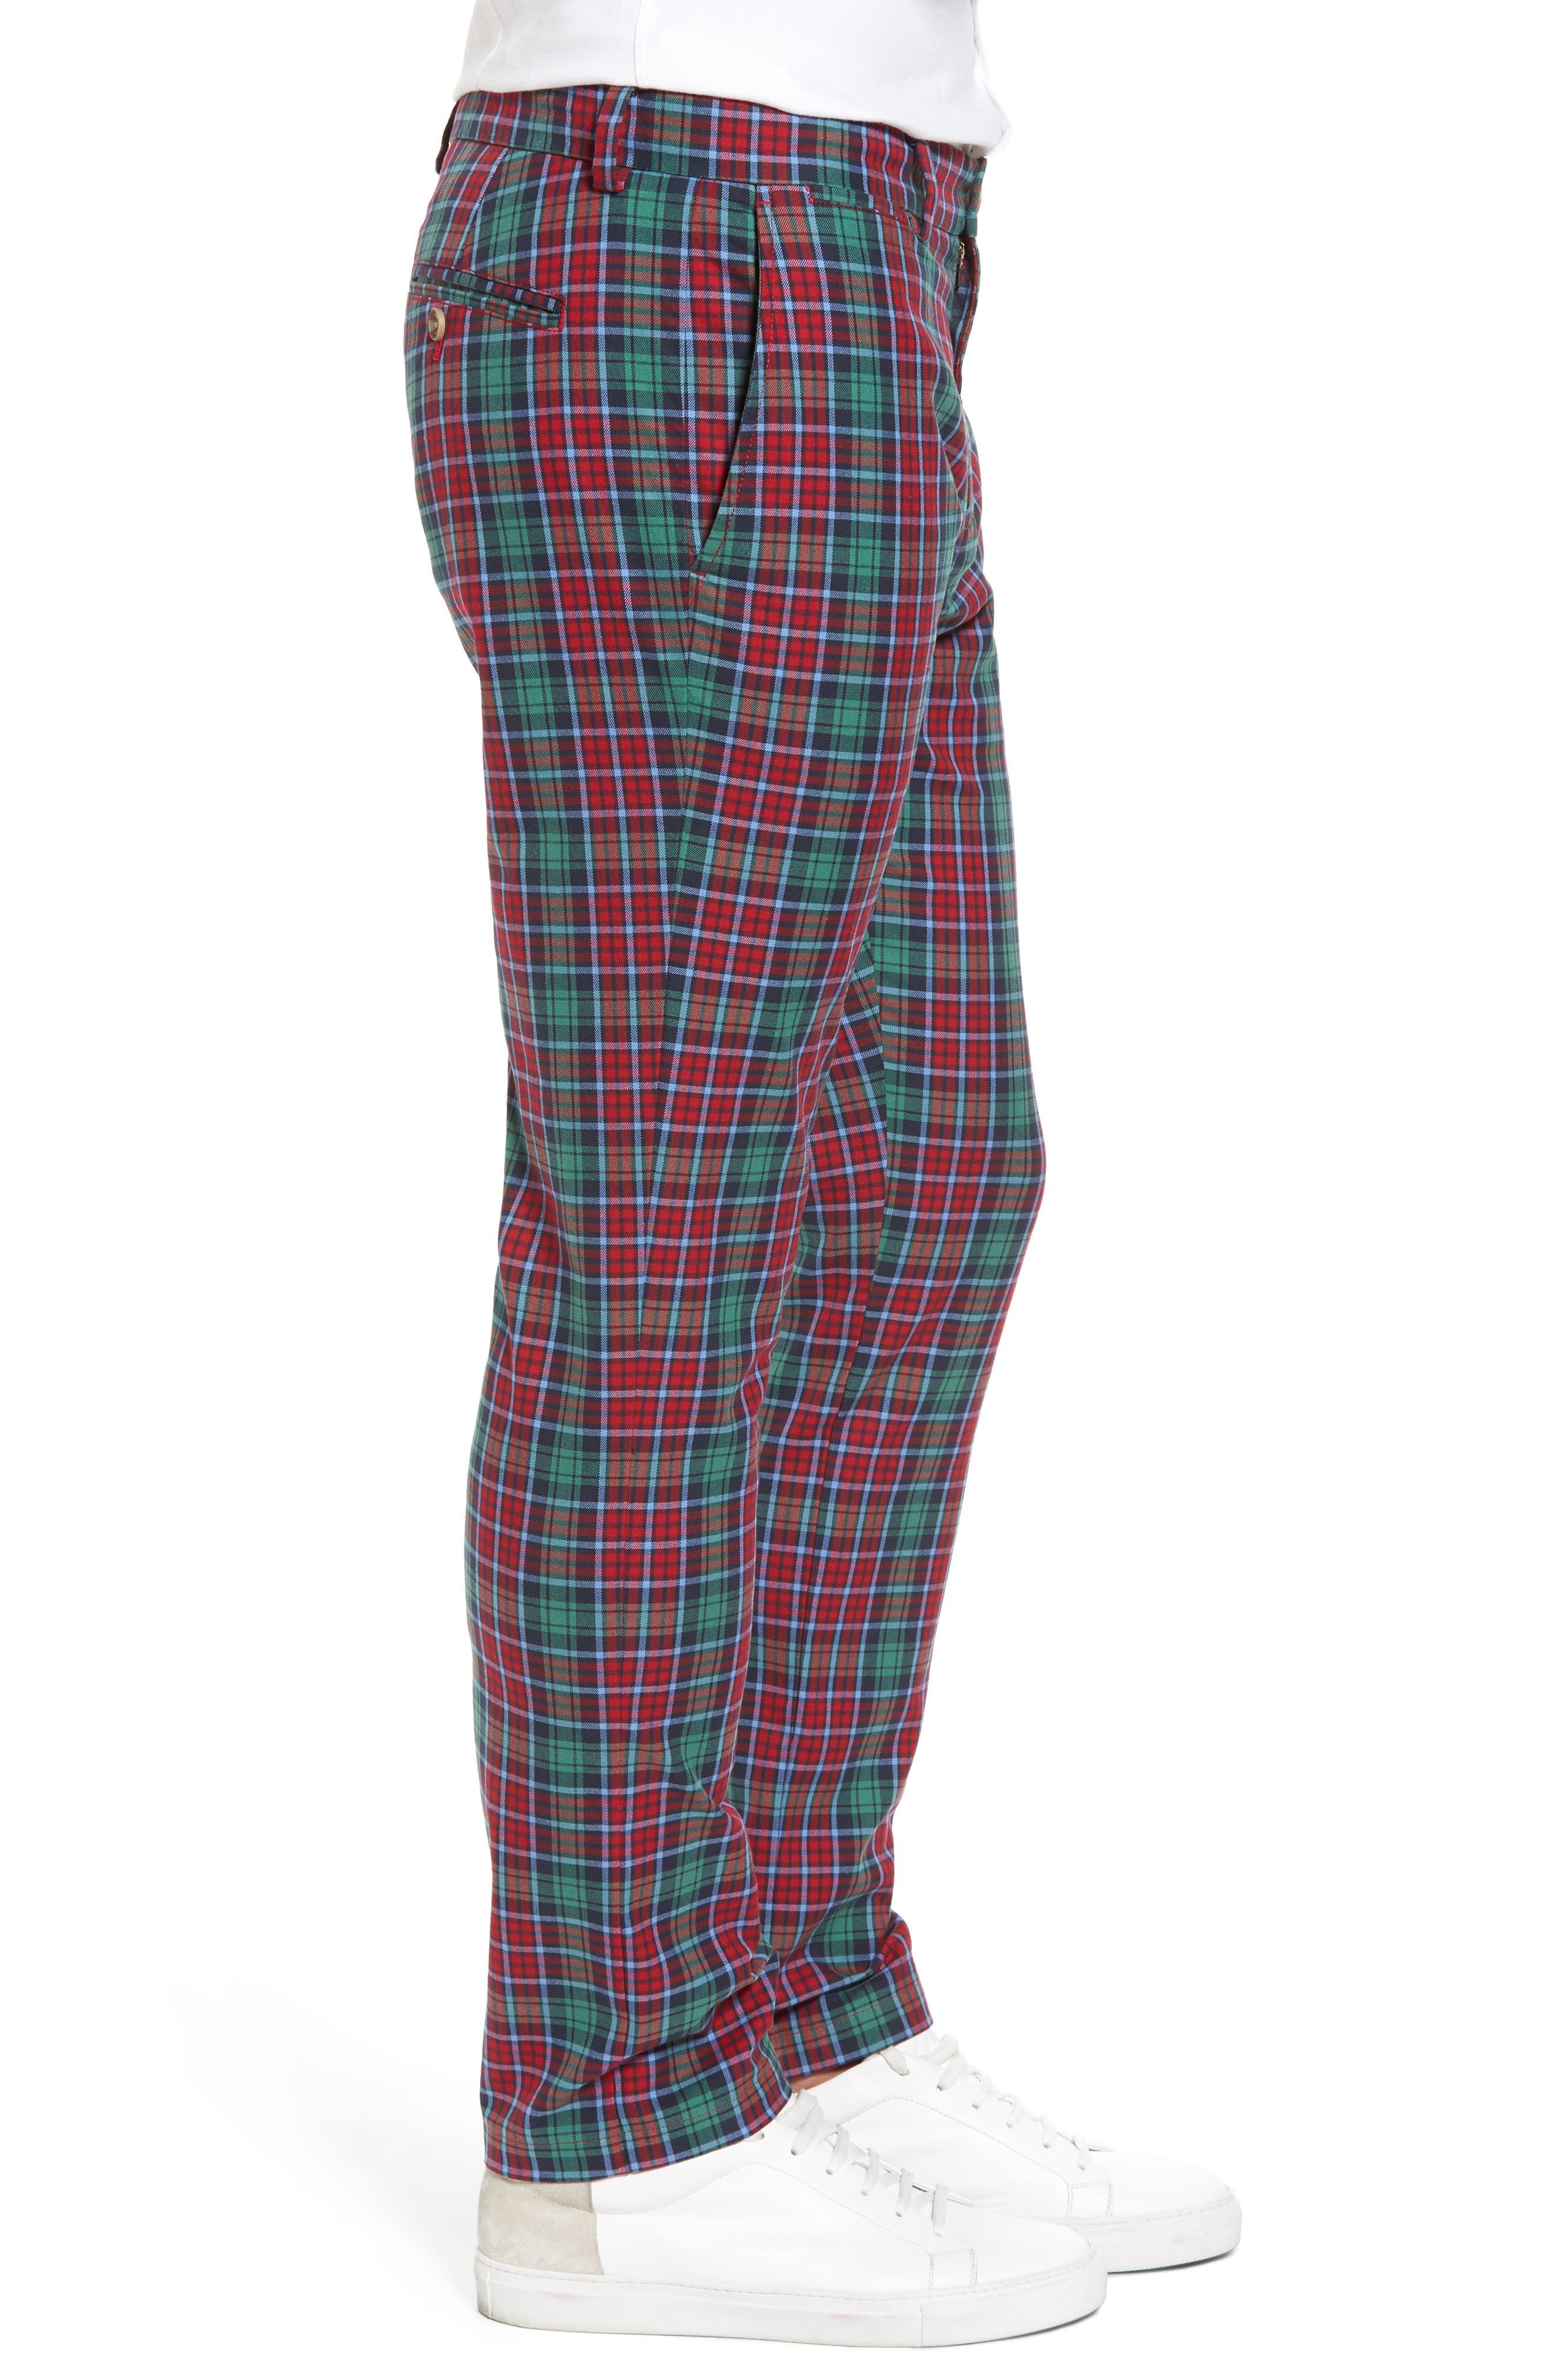 Leddy Park Slim Plaid Pants,                             Alternate thumbnail 3, color,                             342